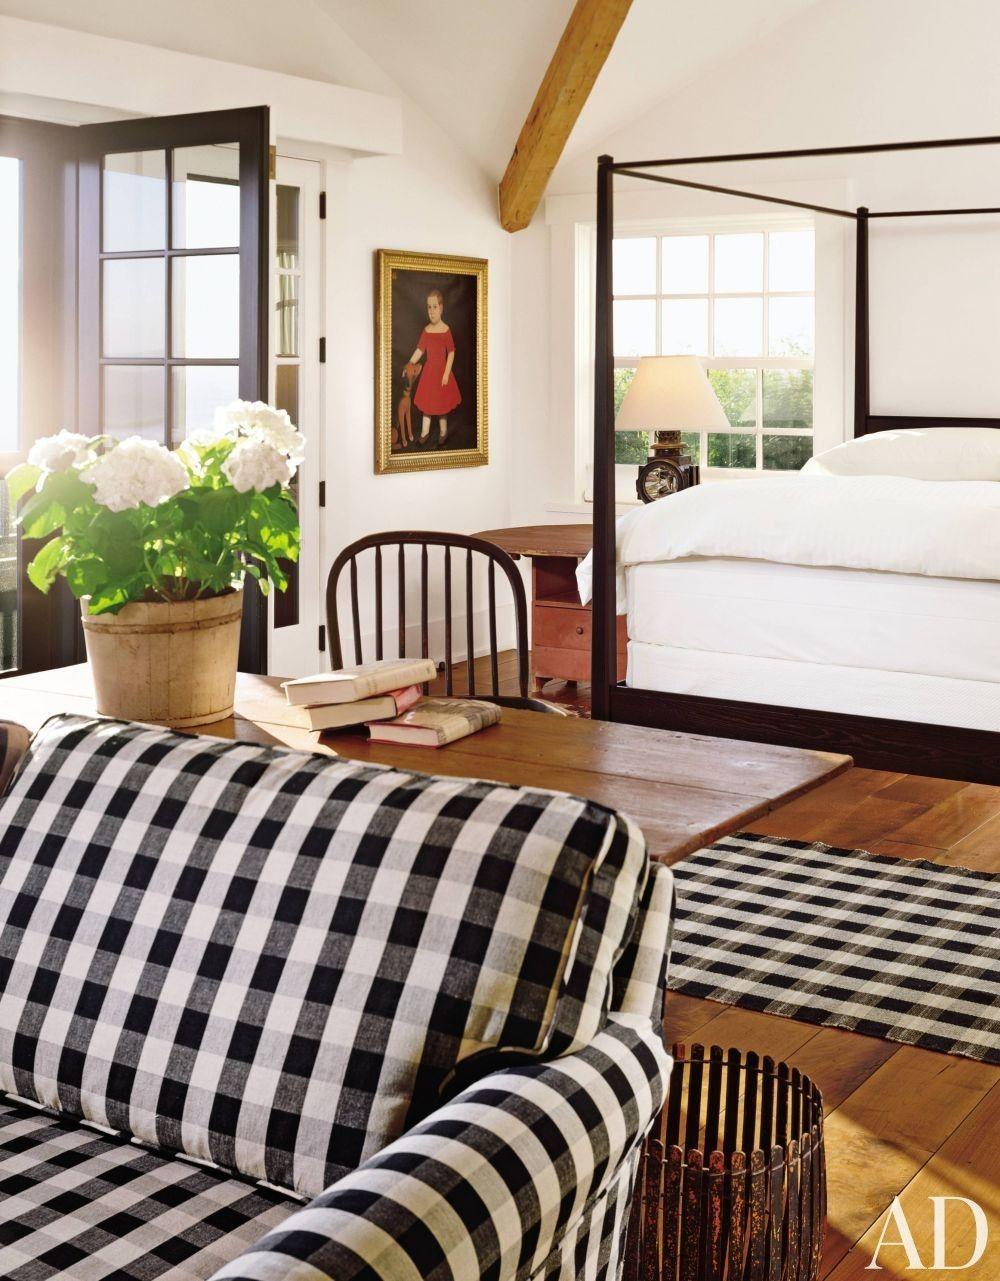 Malibu Bedroom Furniture Traditional Bedroom Designed By Karin Blake For A Malibu Home